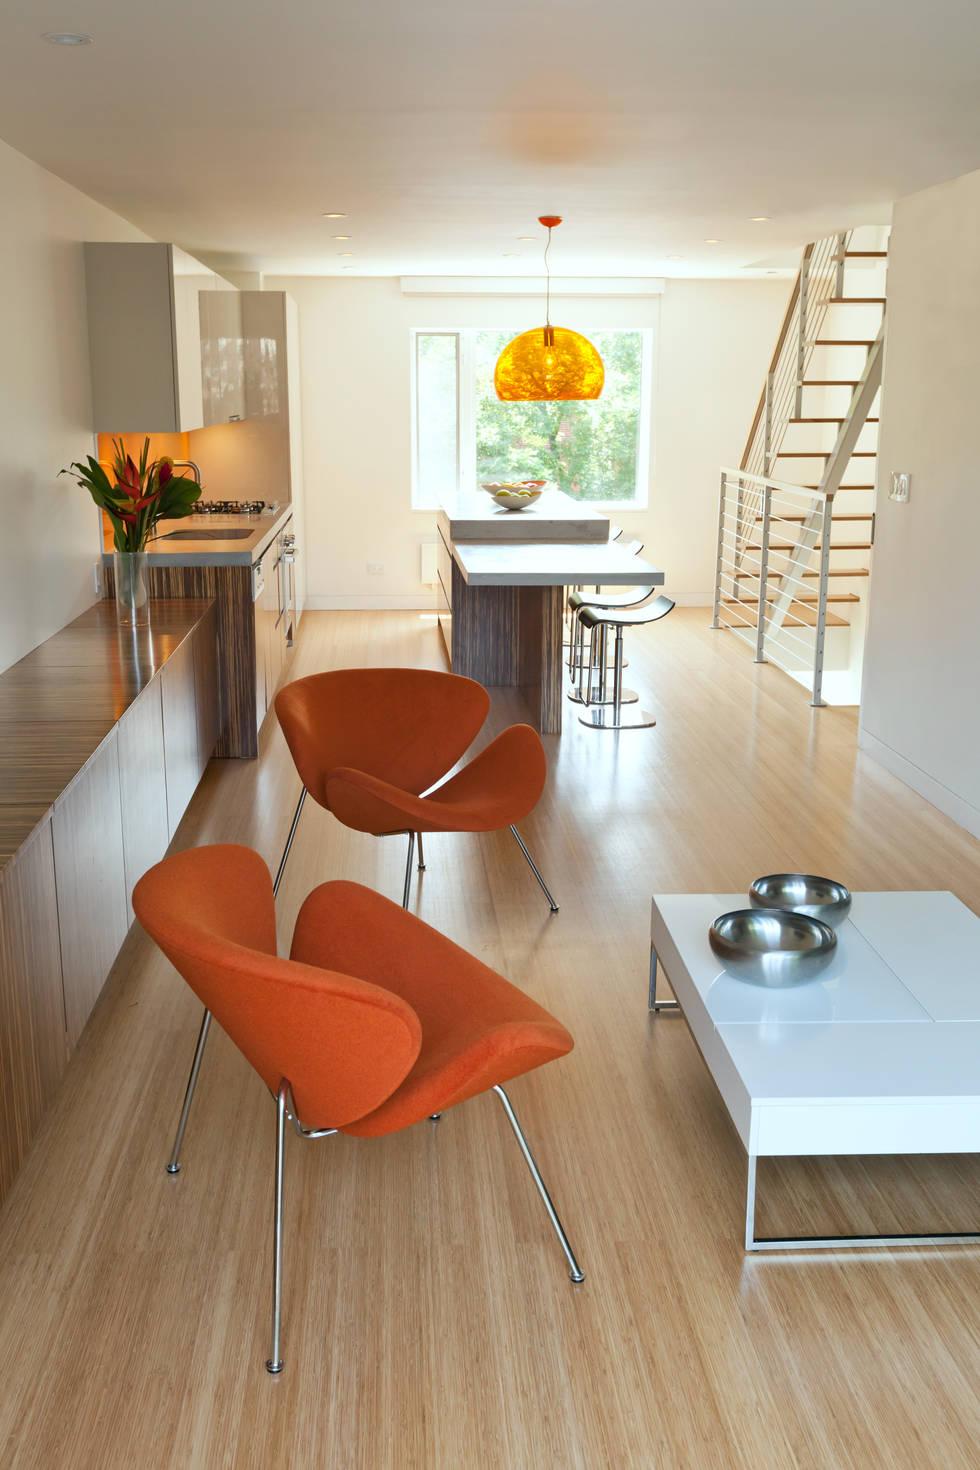 Living in NYC: A quick tour through a contemporary home